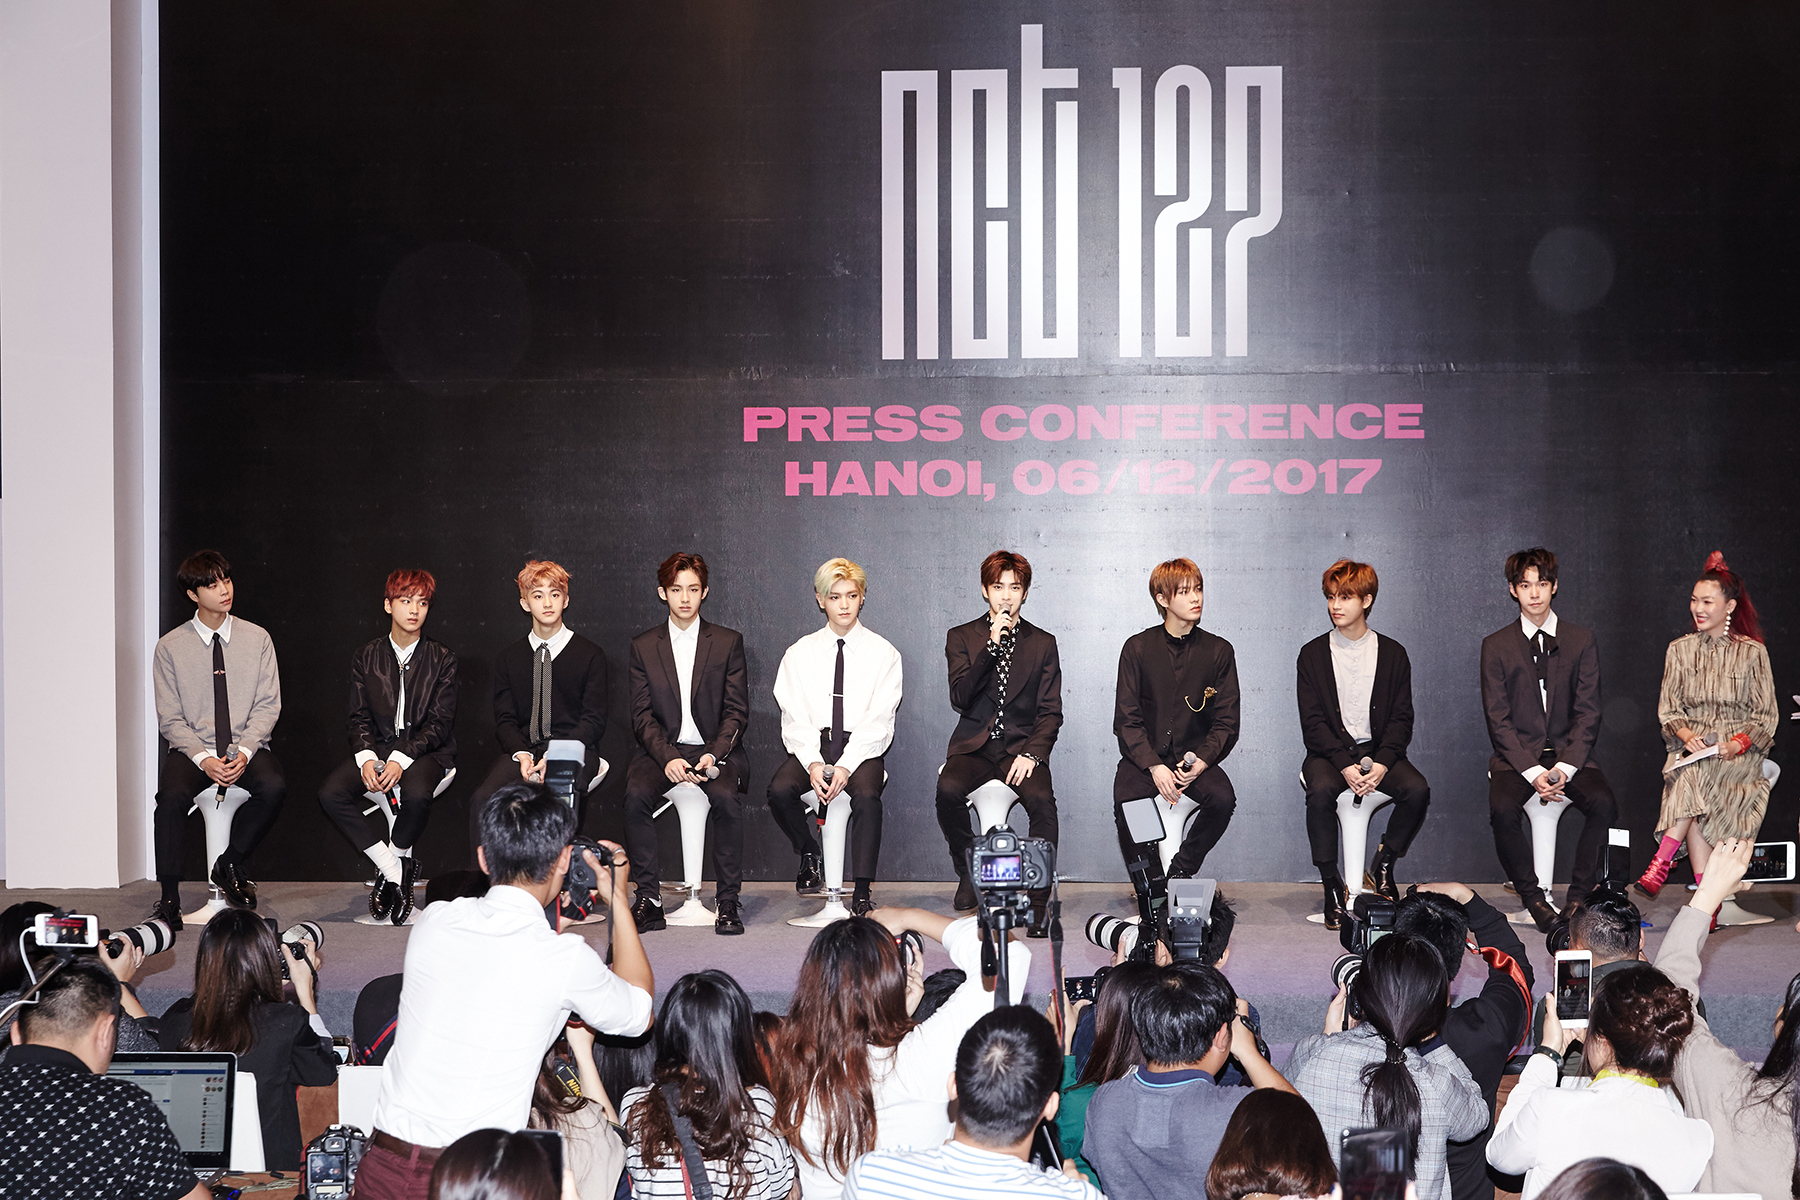 NCT 127出道后首次越南记者见面会盛况空前